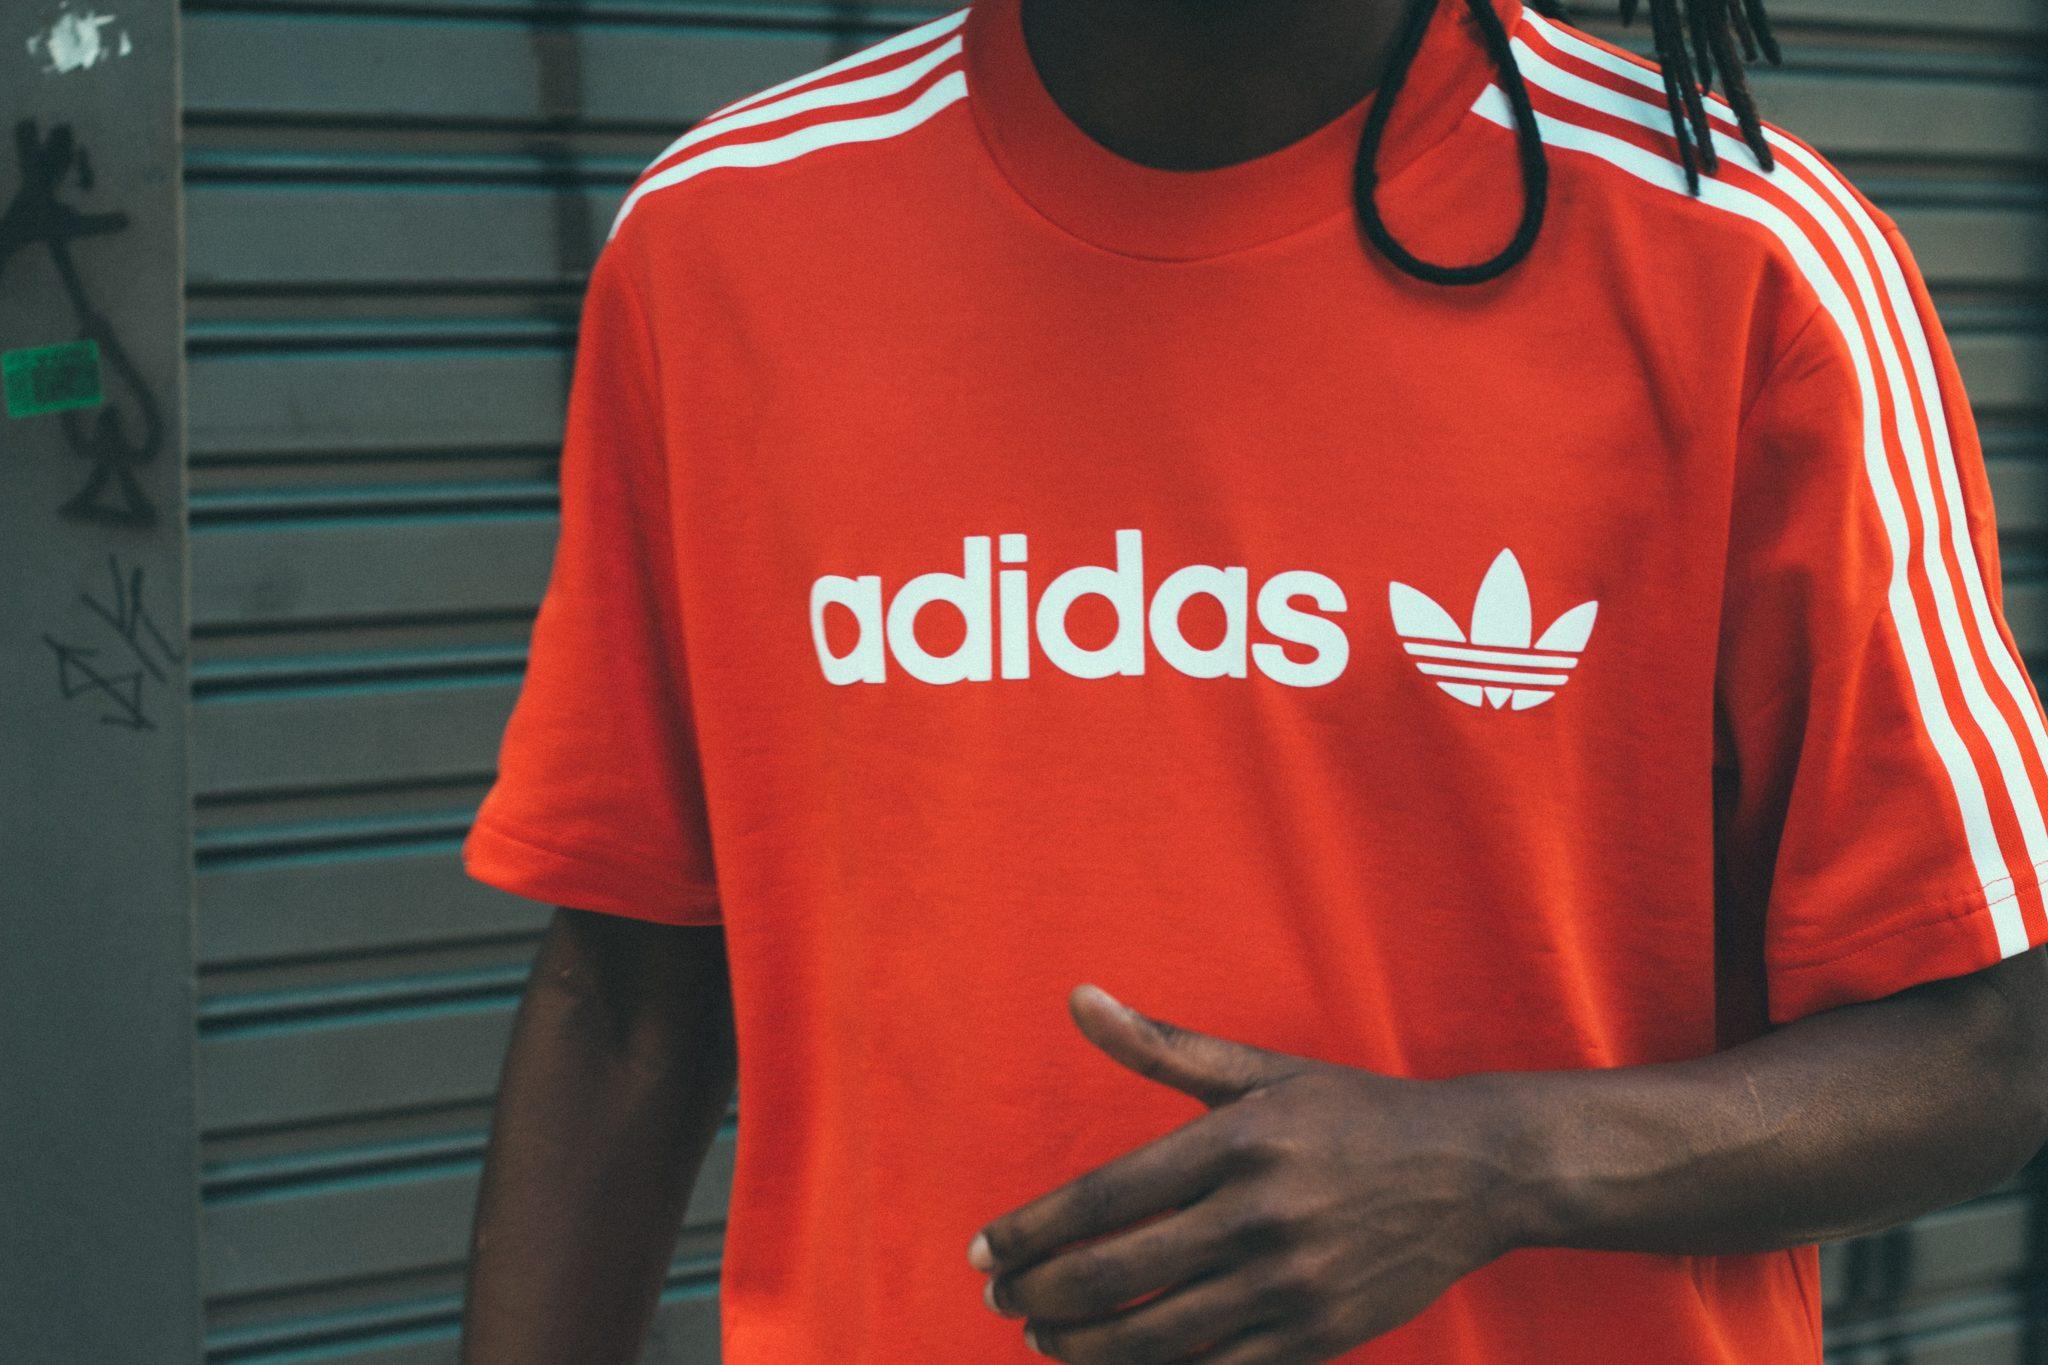 Adidas bedankt loyale klanten